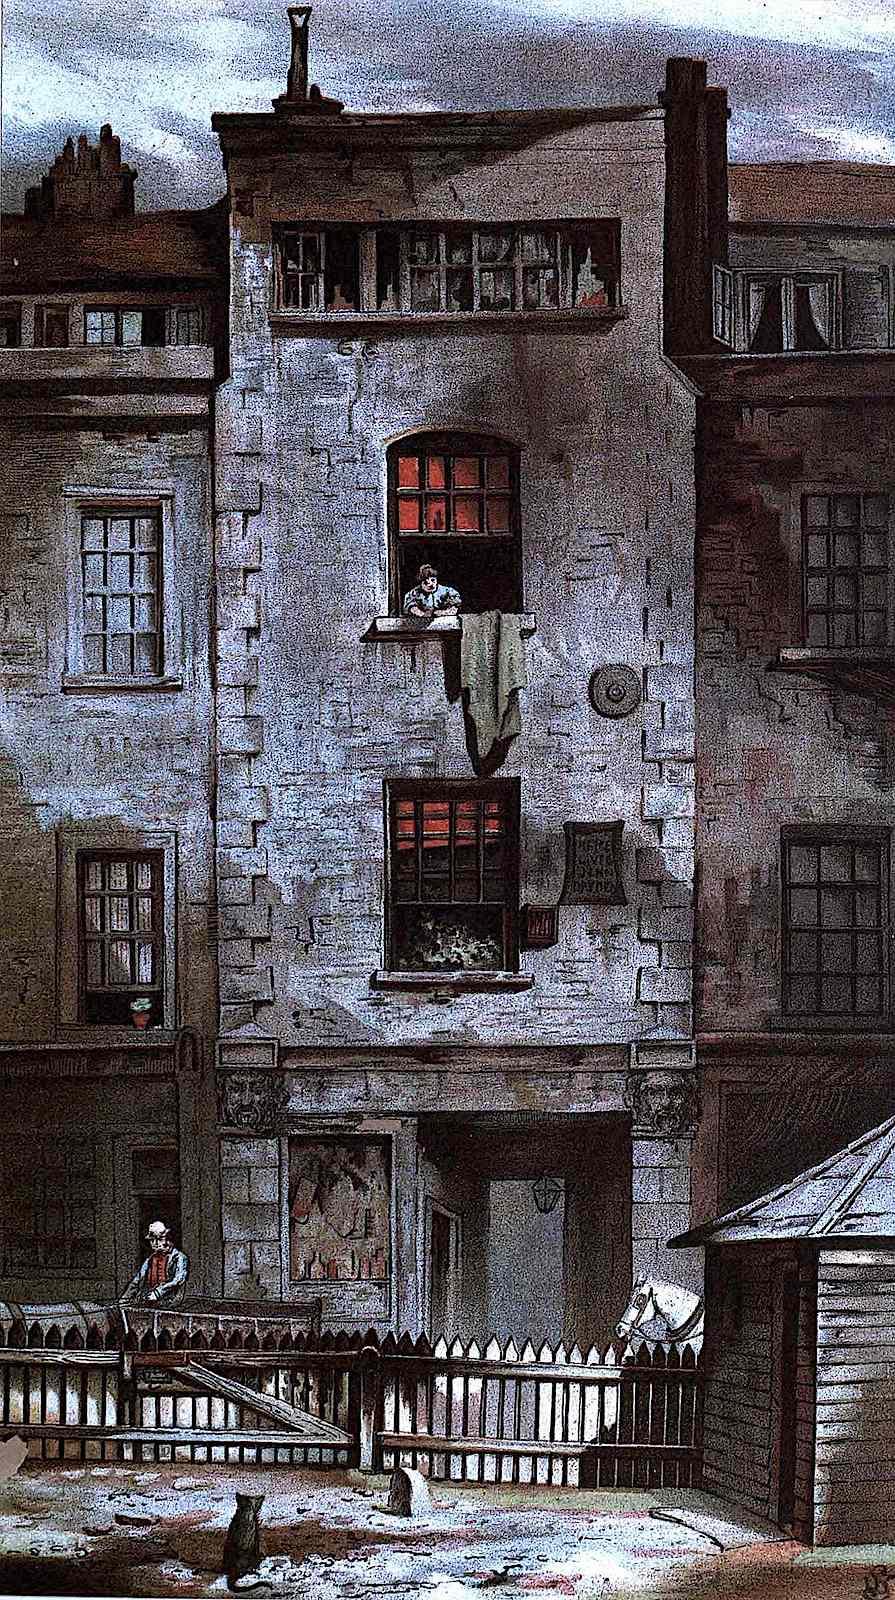 a 1900 London neighborhood illustration